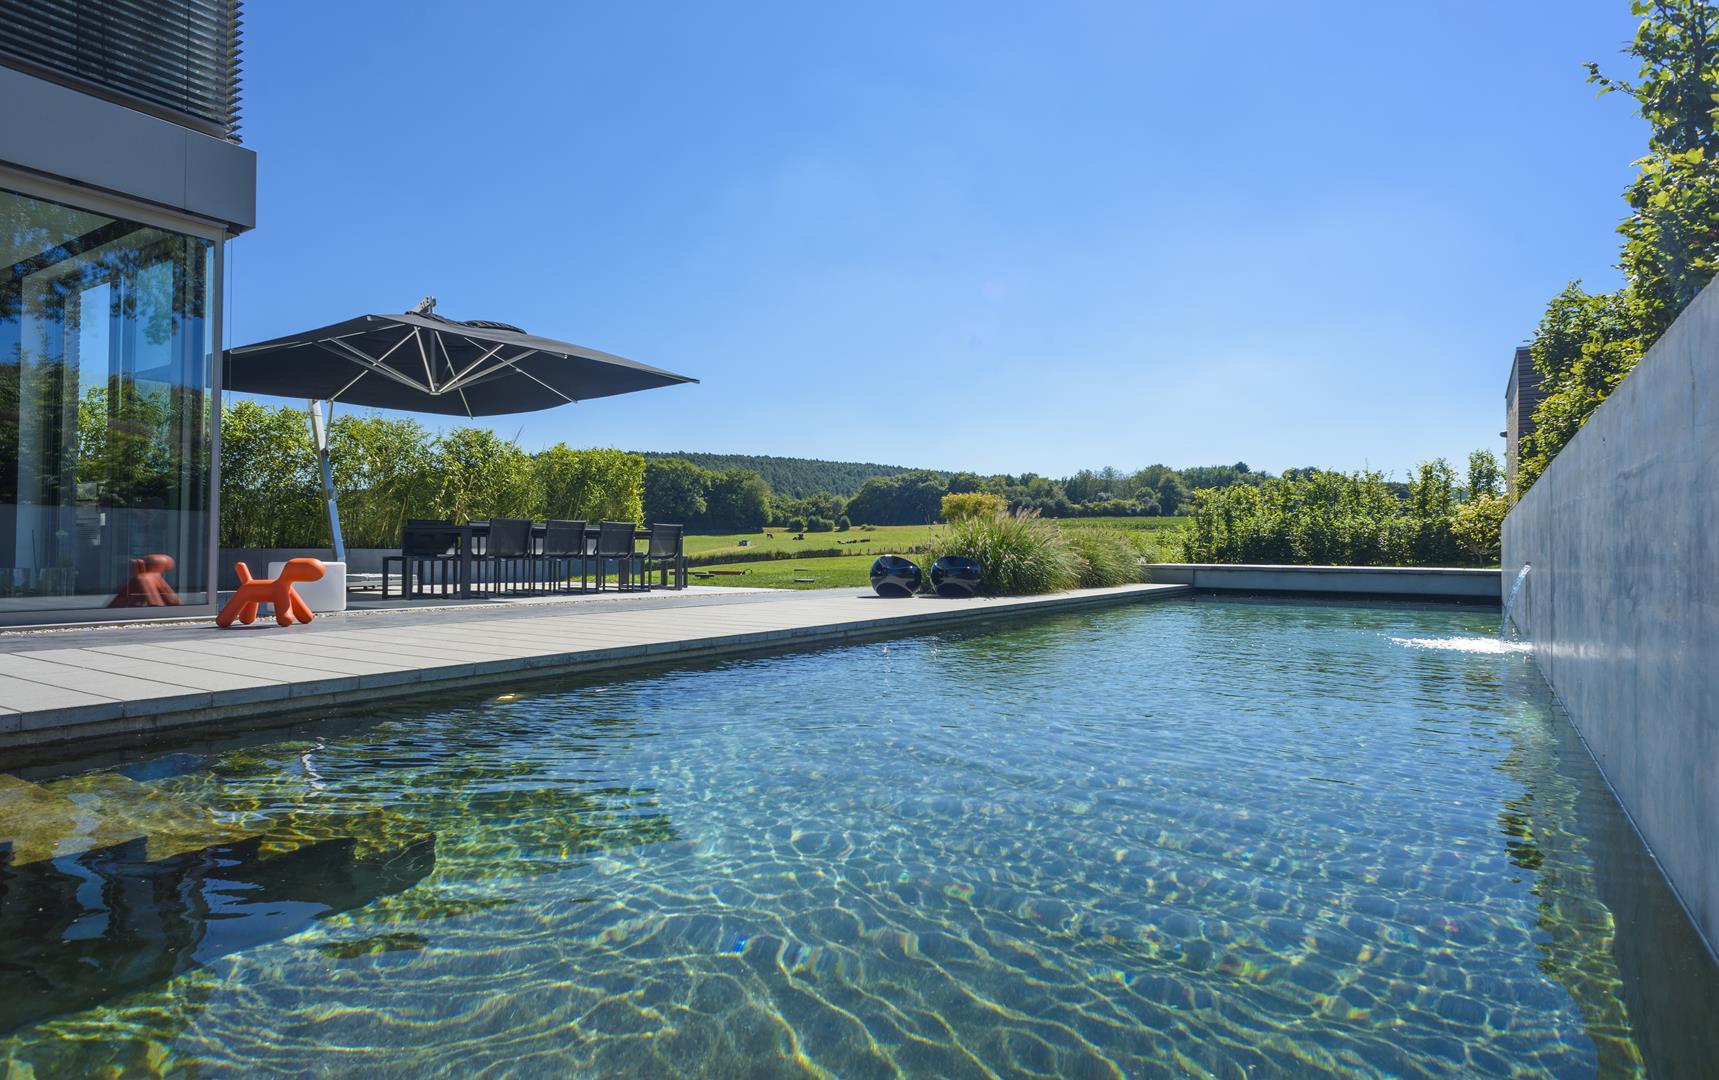 Willy naessens swimming pools zwembad bouwers for Zwembaden verkoop